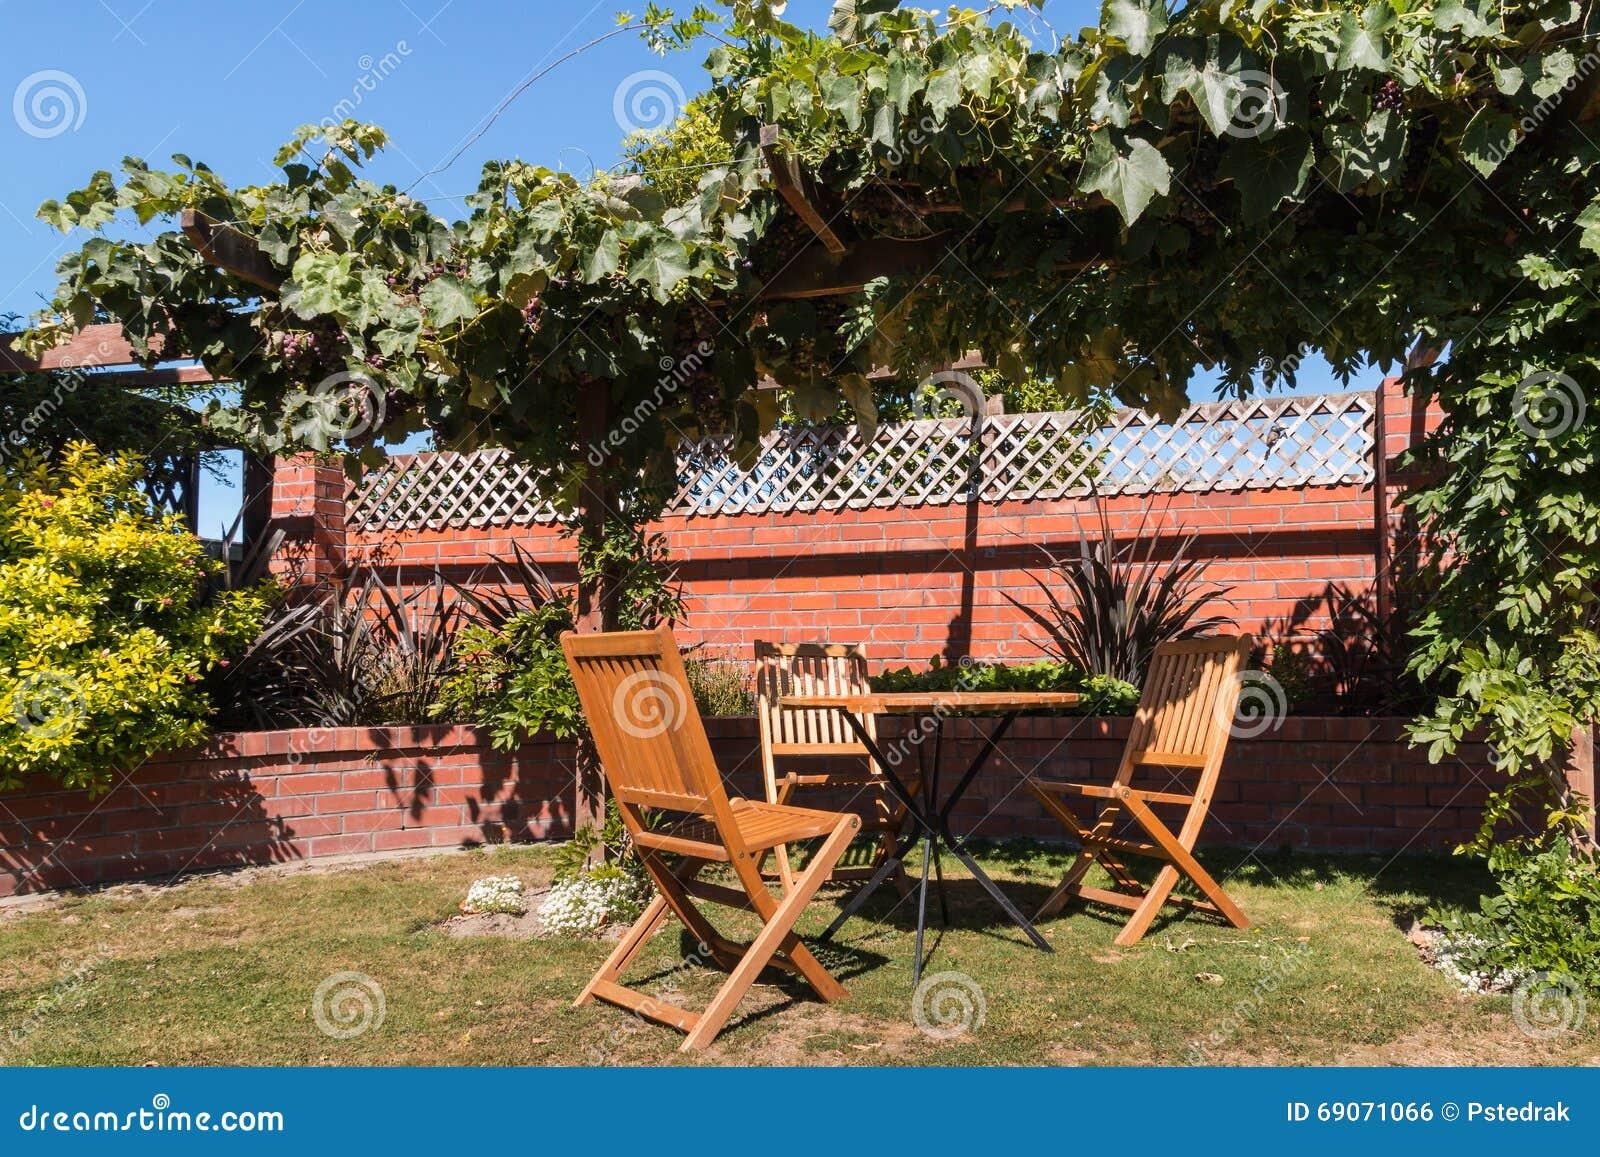 Ordinaire Download Garden Furniture Under Grapevine Pergola Stock Photo   Image Of  Table, Grapevine: 69071066